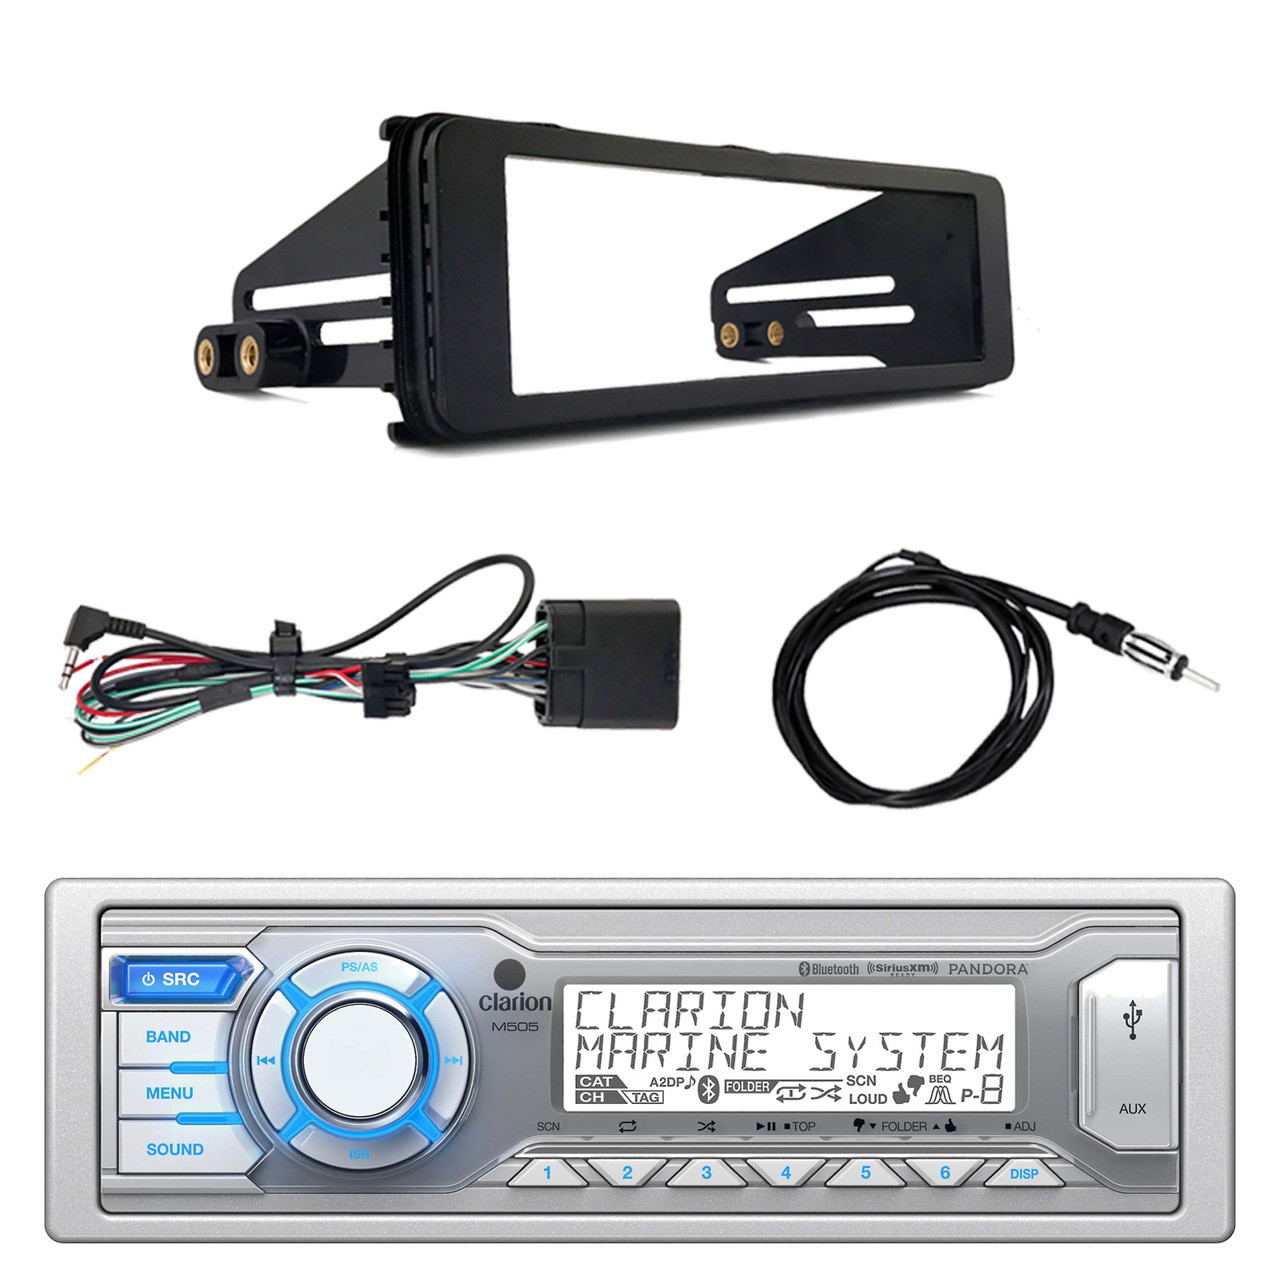 hight resolution of clarion m505 marine bluetooth radio siriusxm tuner harley dash kit wire harness for clarion m505